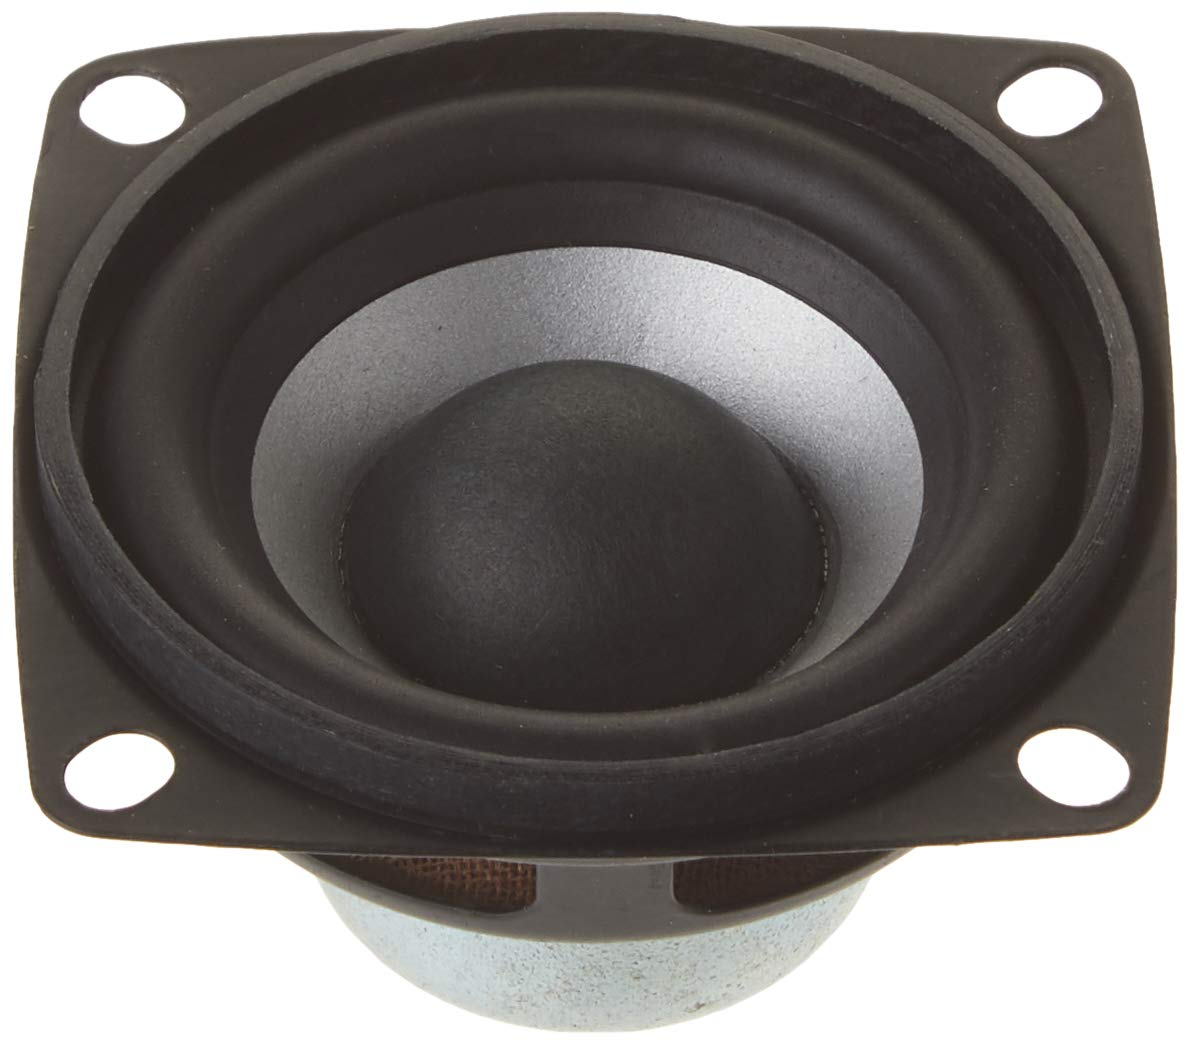 "DROK Micro 12W Stereo Audio Speaker 2"" inch 4 Ohm Full Range Speaker 2.0/2.1 Hifi DIY Loudspeaker Woofer Active Light Speaker Indoor External Usage Auto Car Motor Motorcycle"